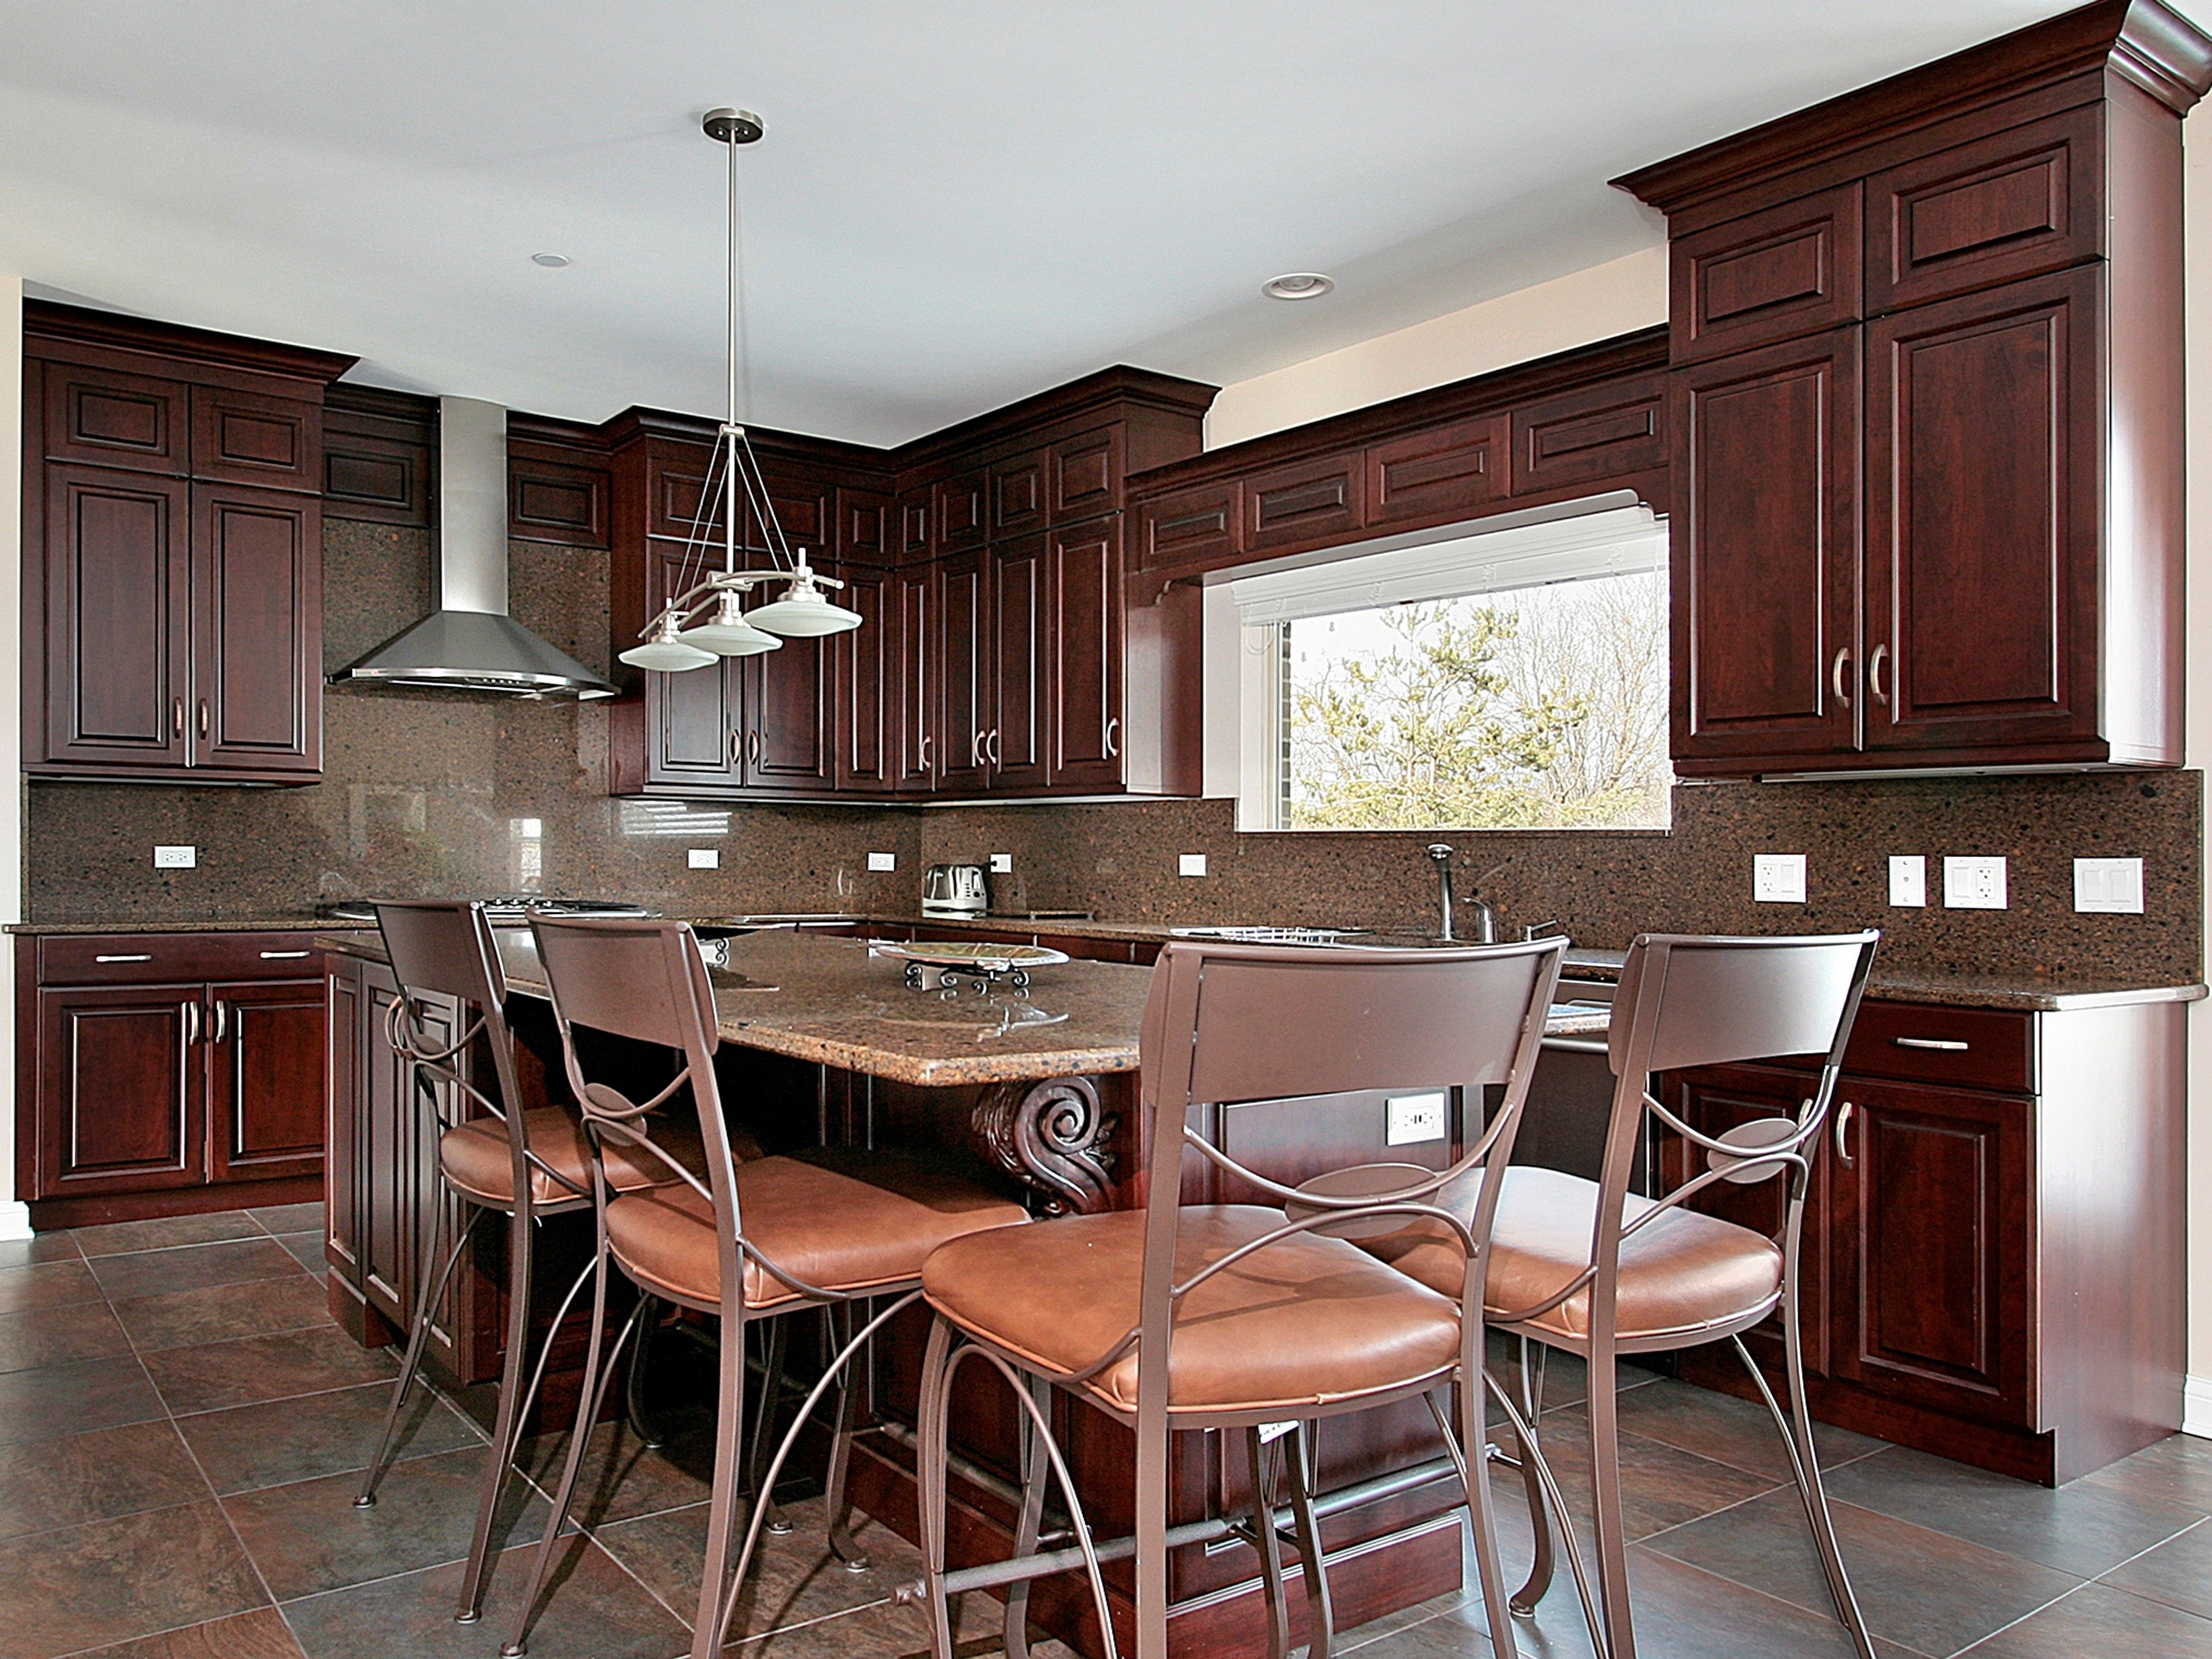 a regal kitchen luxury kitchen bath remodel pinterest. Black Bedroom Furniture Sets. Home Design Ideas